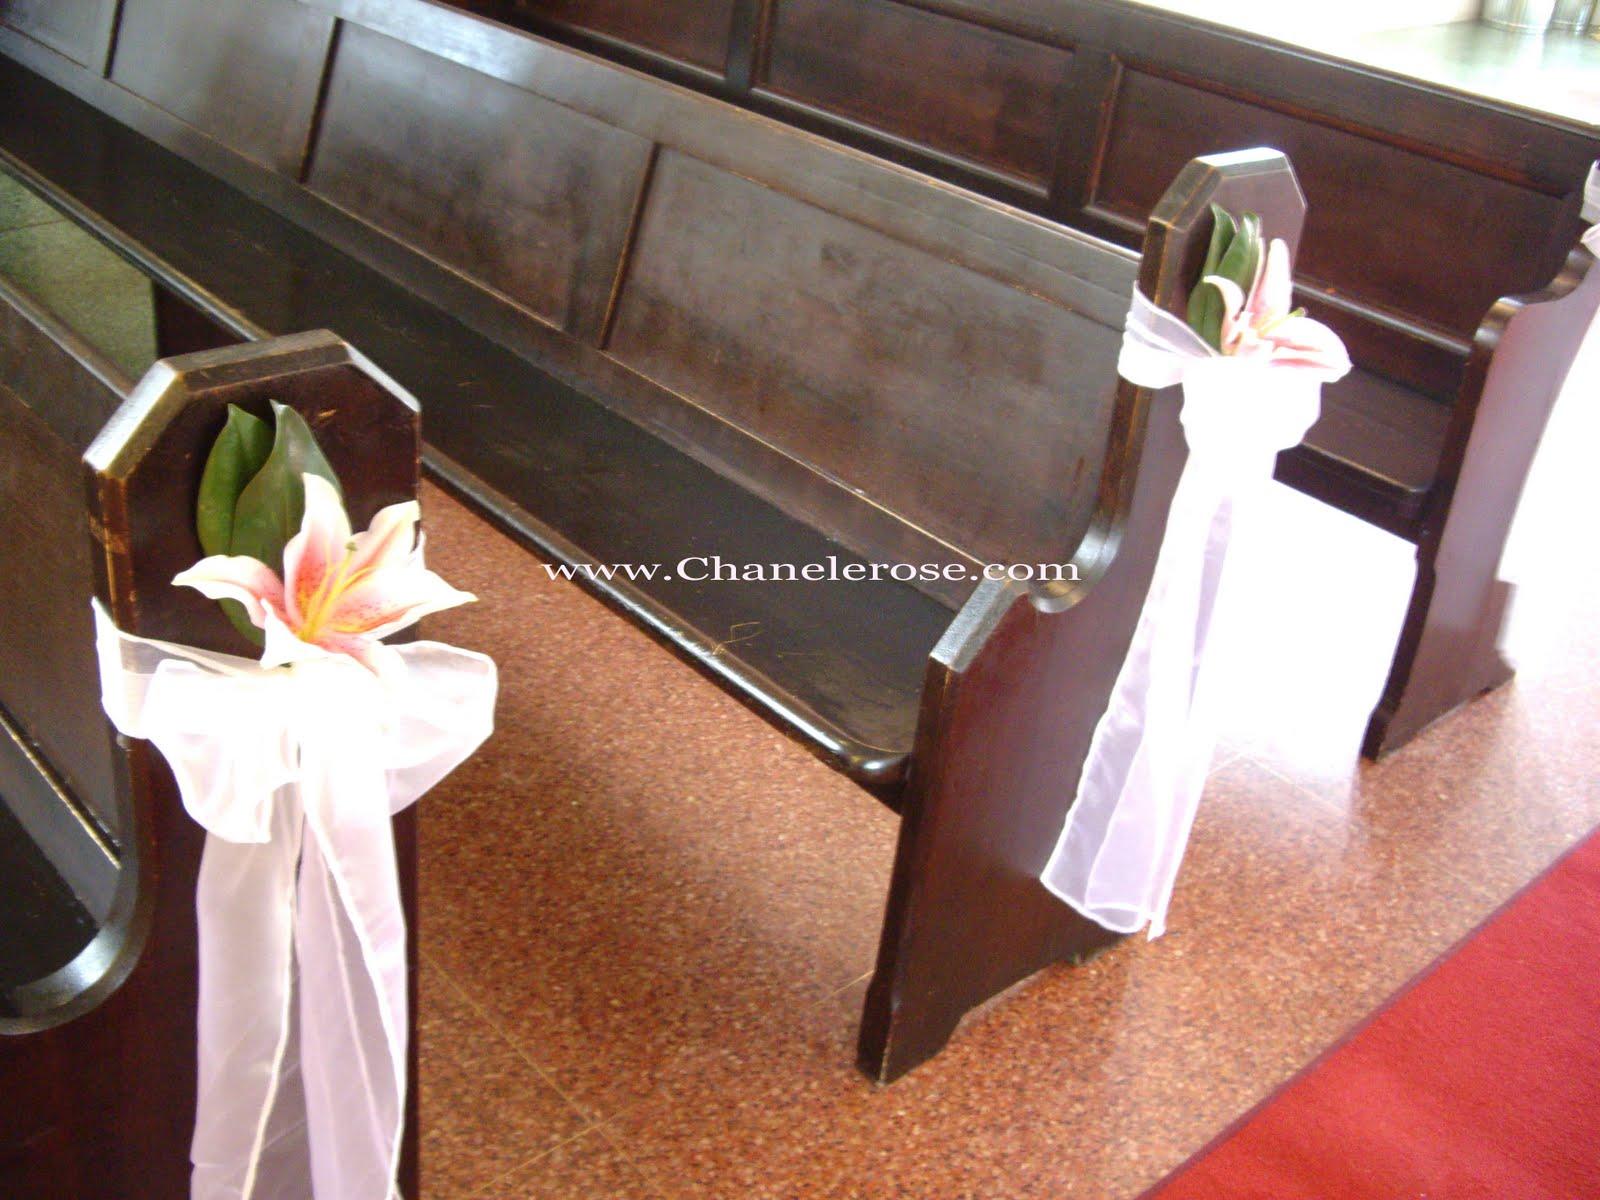 Church Decorations For Weddings